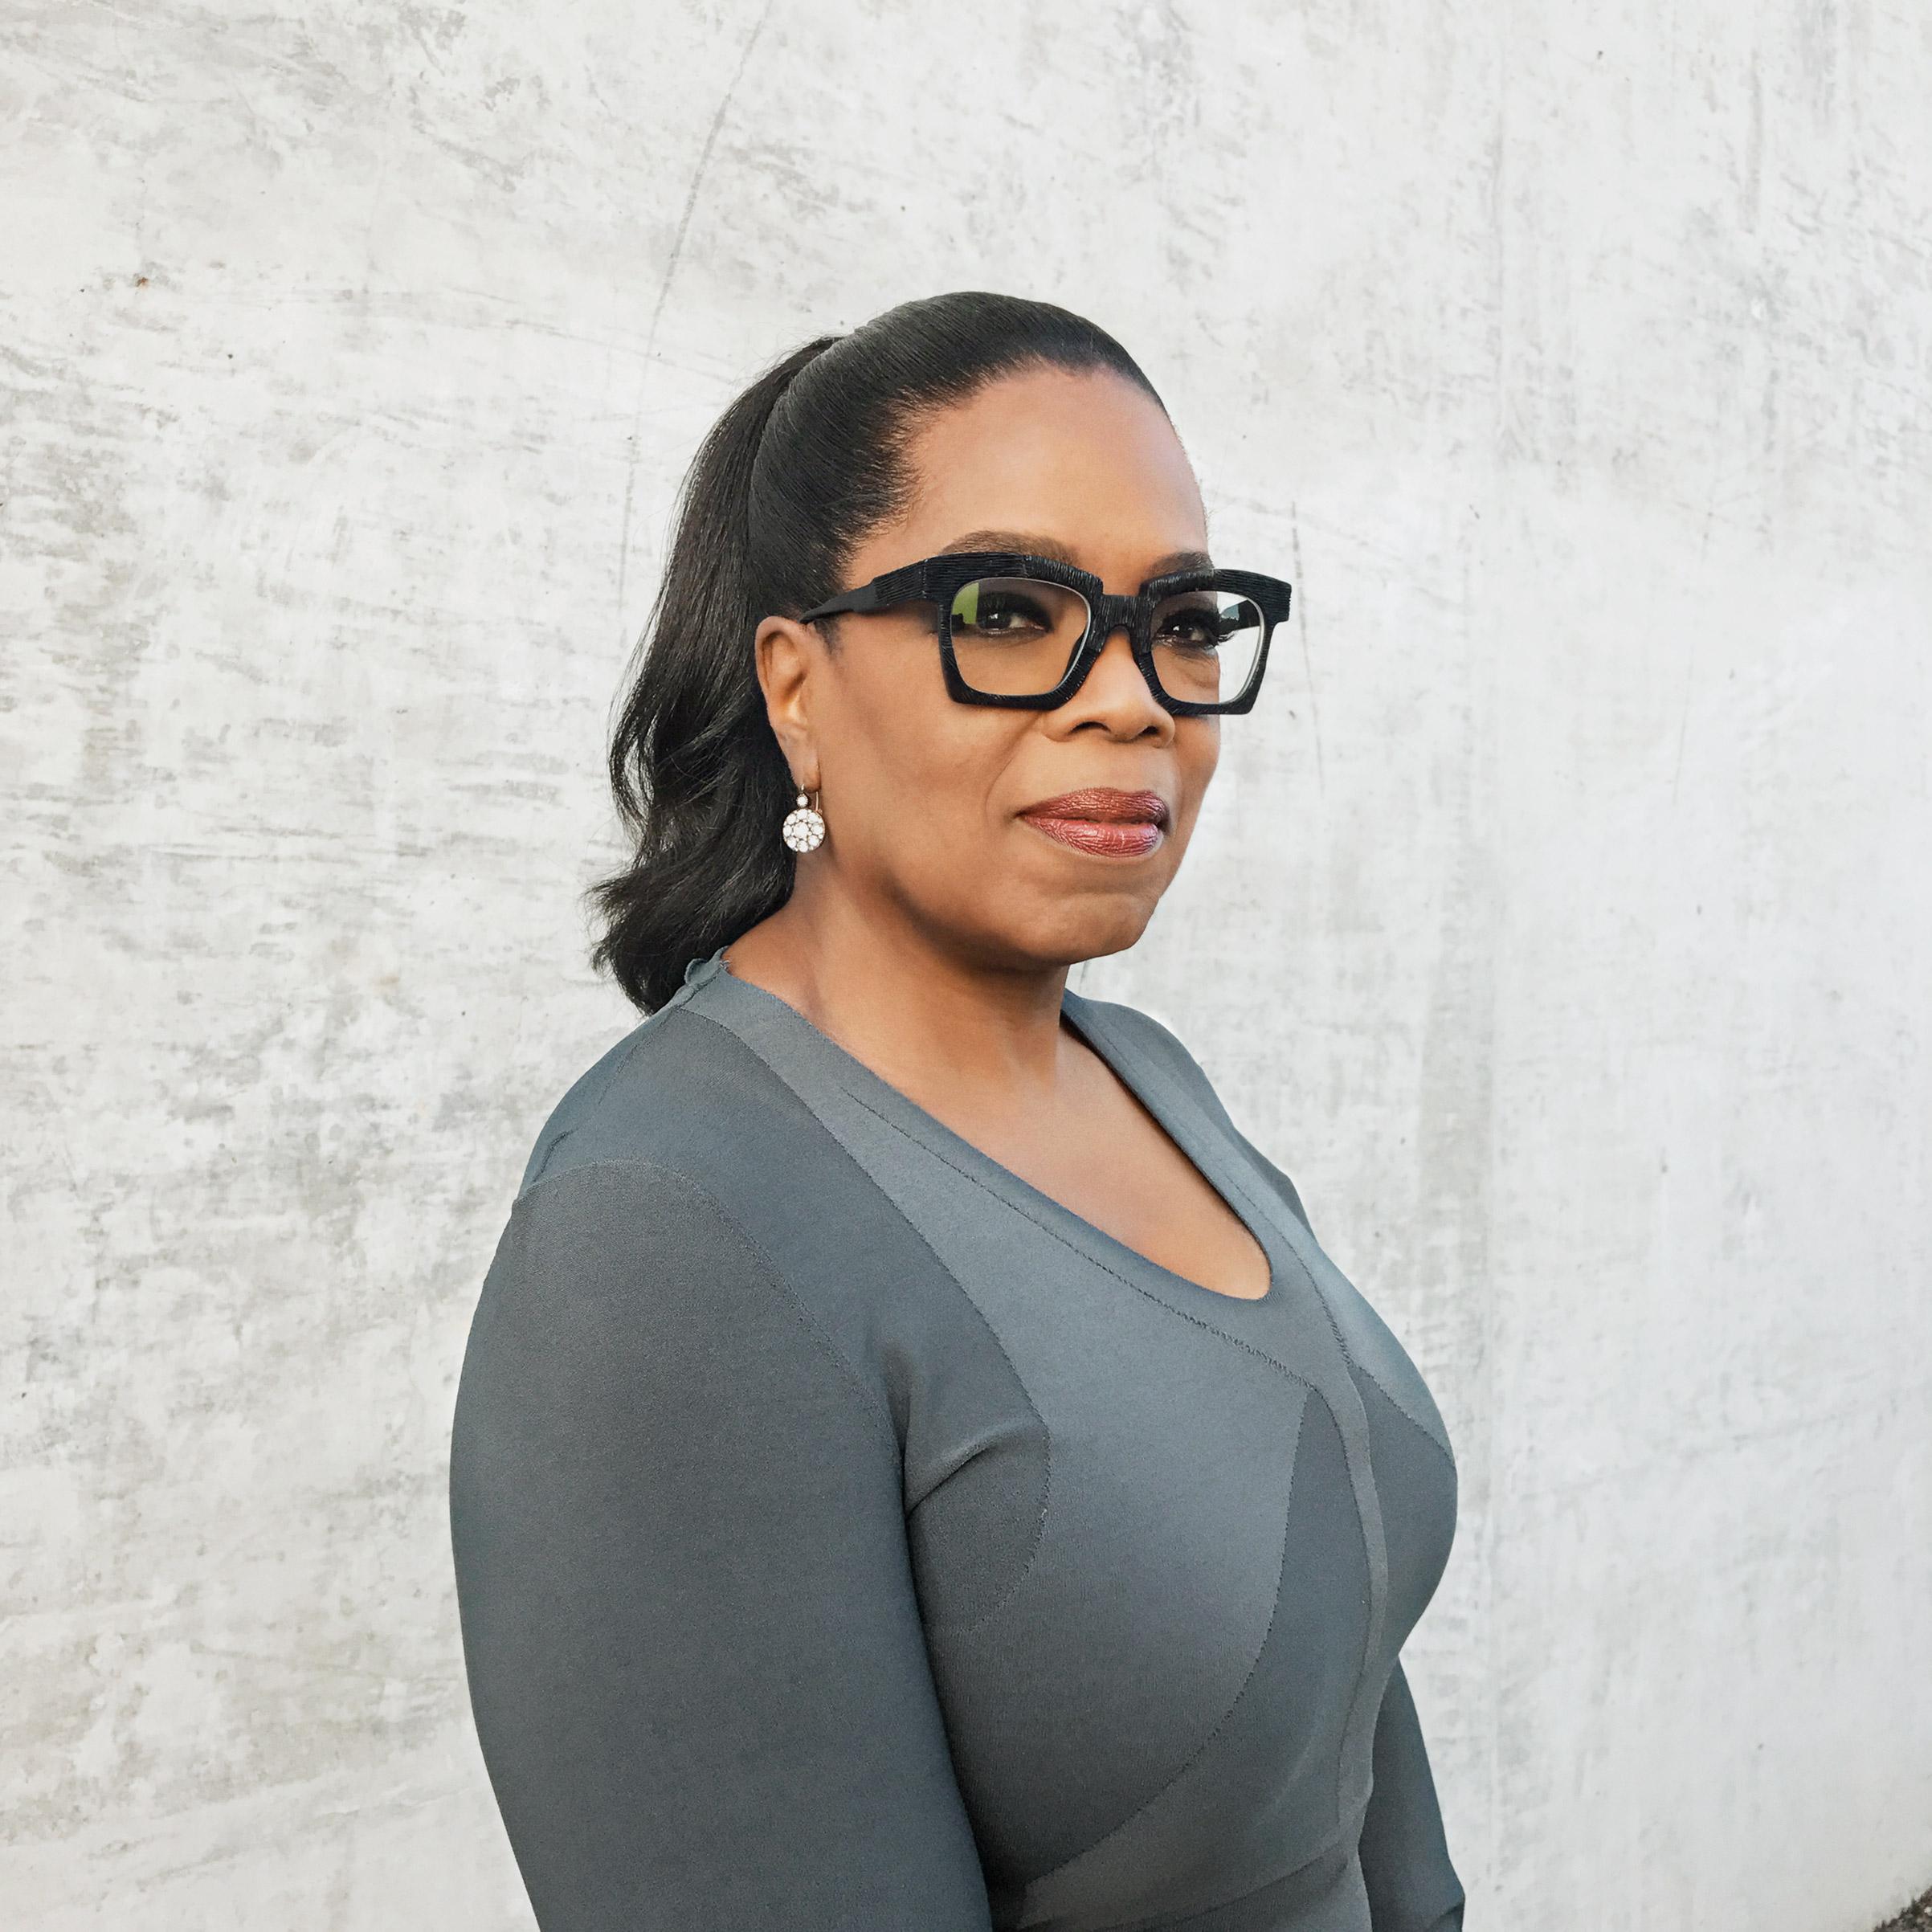 Oprah_winfrey_luisa-dorr-time-firsts-2017